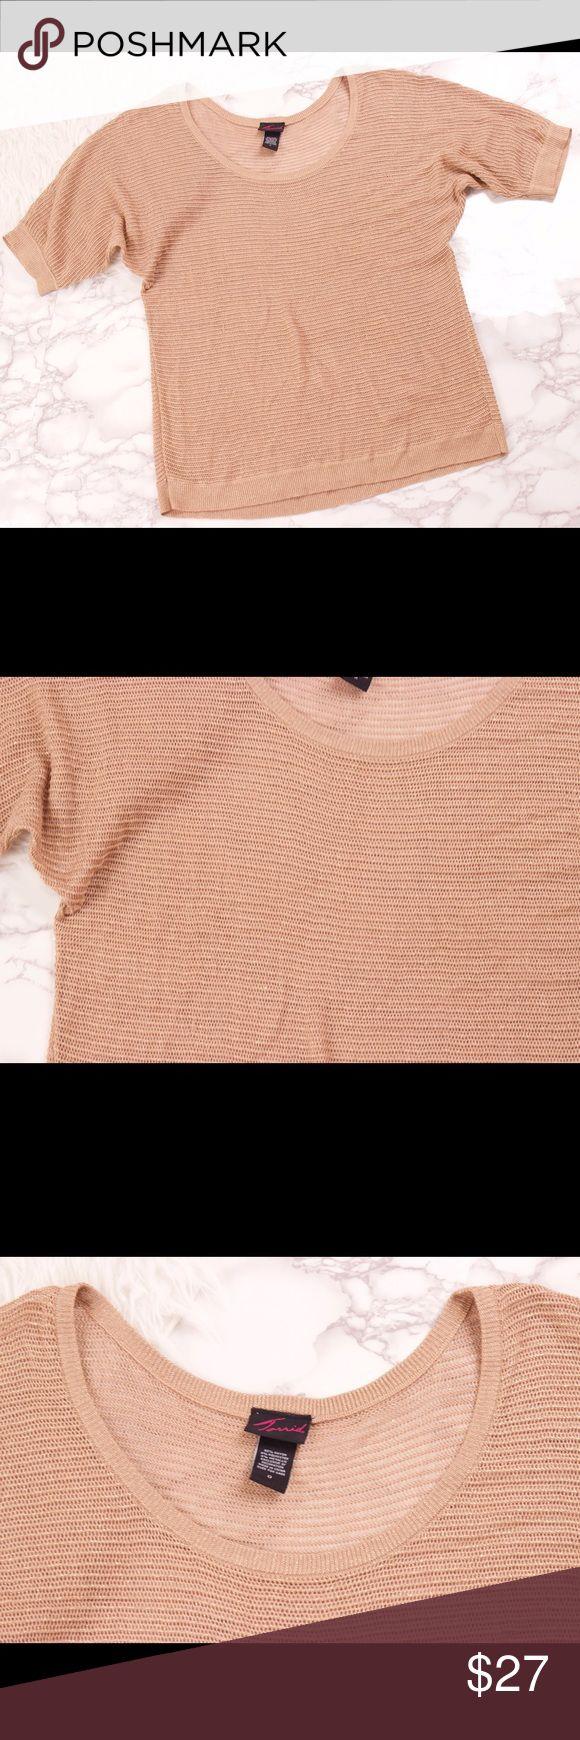 Torrid gold loose knit blouse top plus size Torrid gold metallic loose knit blouse top. Draped batwing sleeves. Scoop neck. Size 0 brand sizing   Shoulder-22 Sleeve-7 Bust-42 Length-28 torrid Tops Blouses